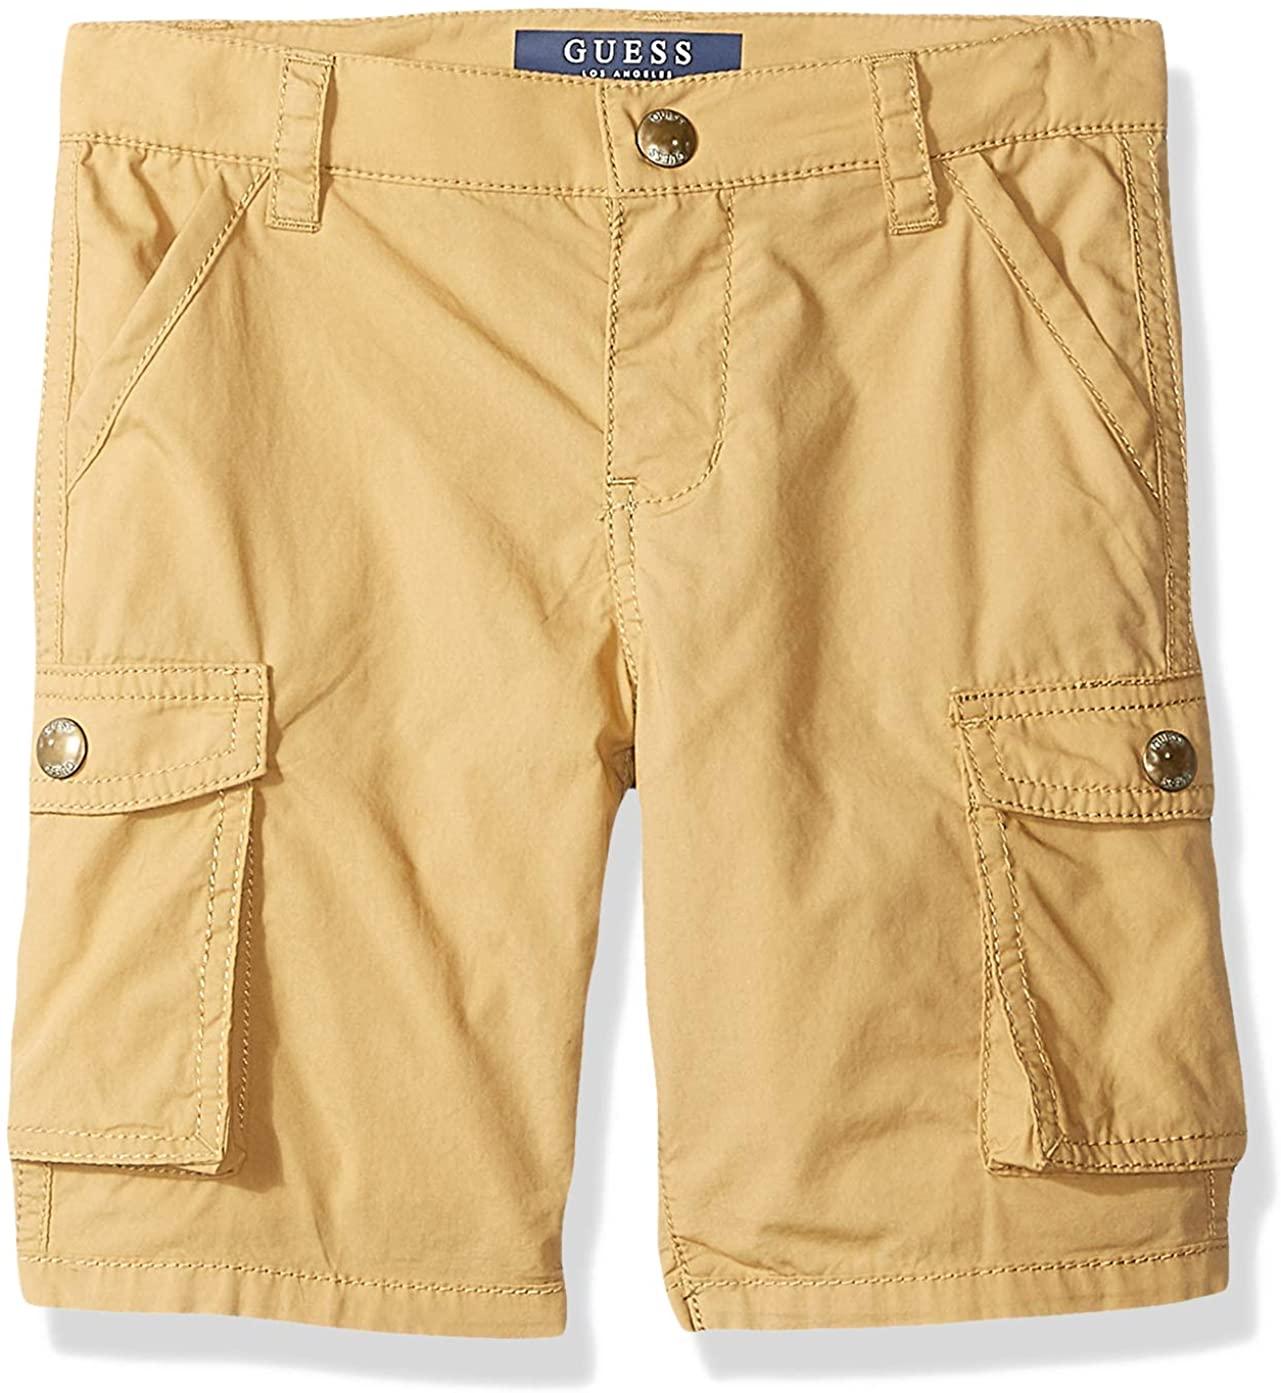 GUESS Boys' Little Cargo Shorts, Honey Pie, 5